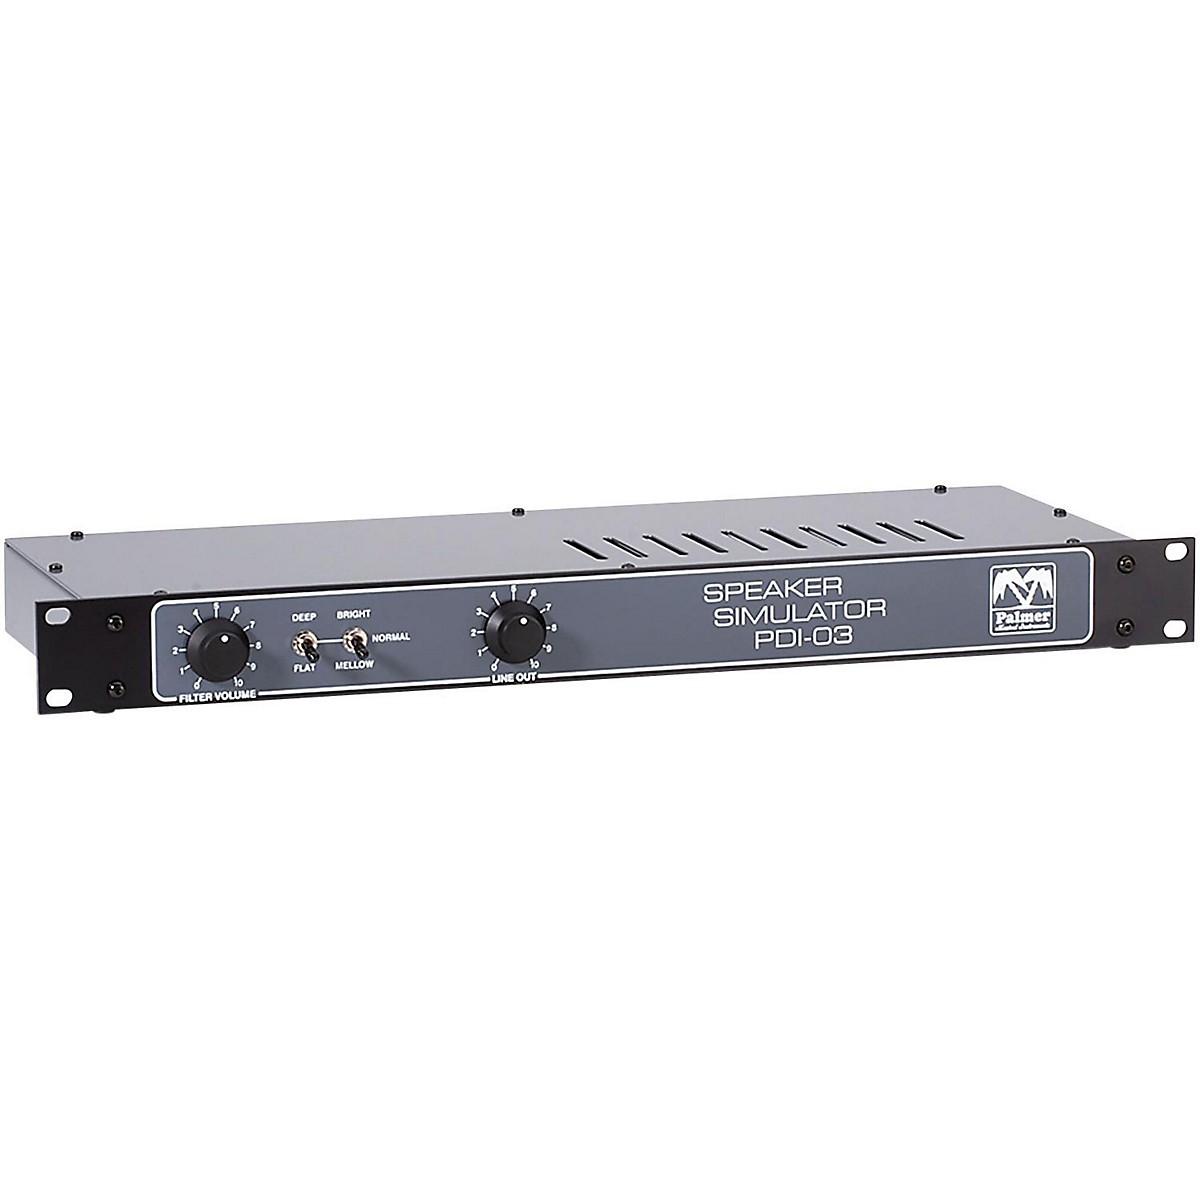 Palmer Audio Palmer Audio PDI 03 L16 Speaker Simulator with Loadbox 8 Ohms